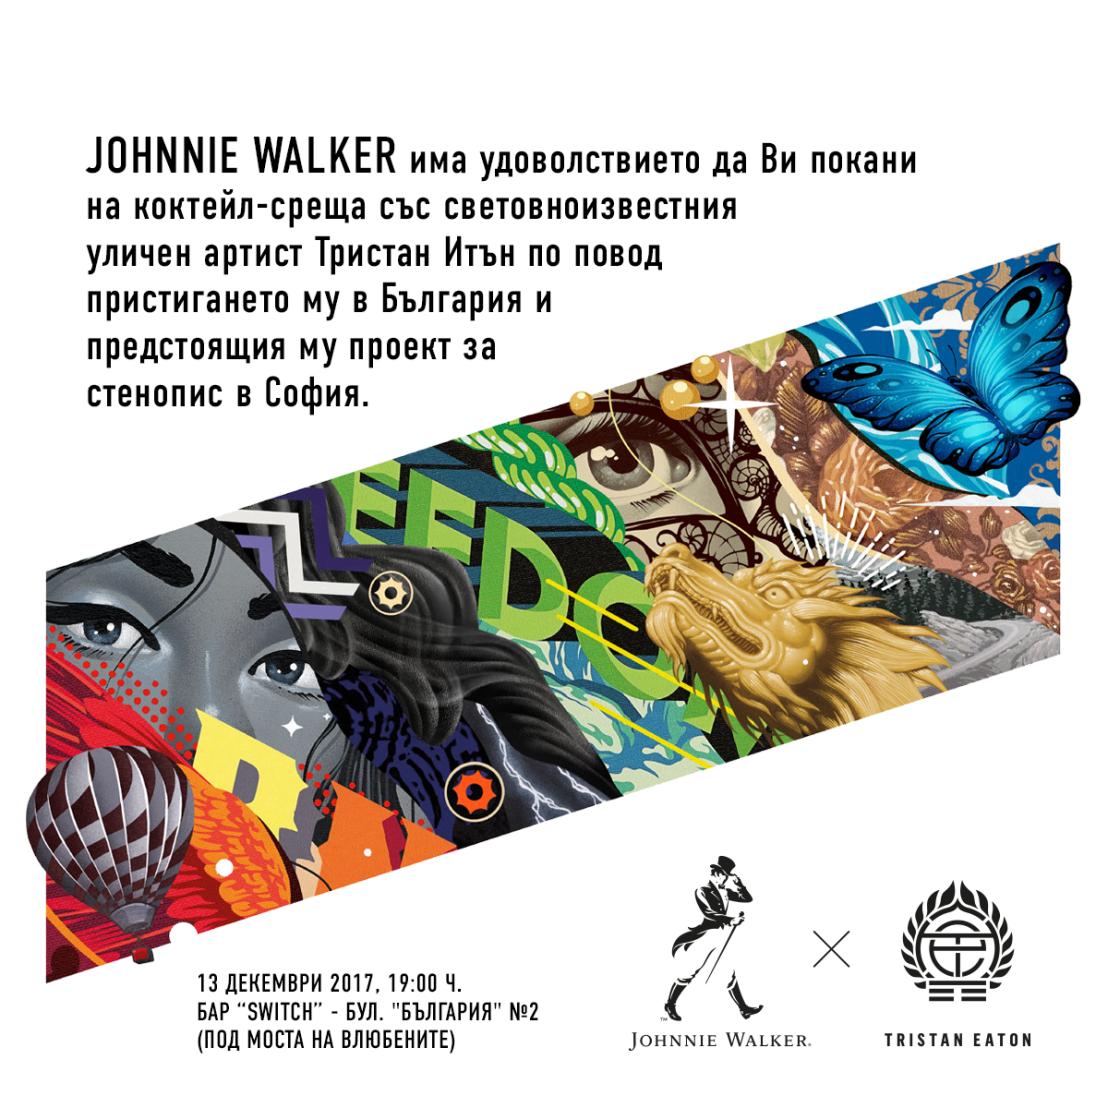 JW_Mural_Invitation_01